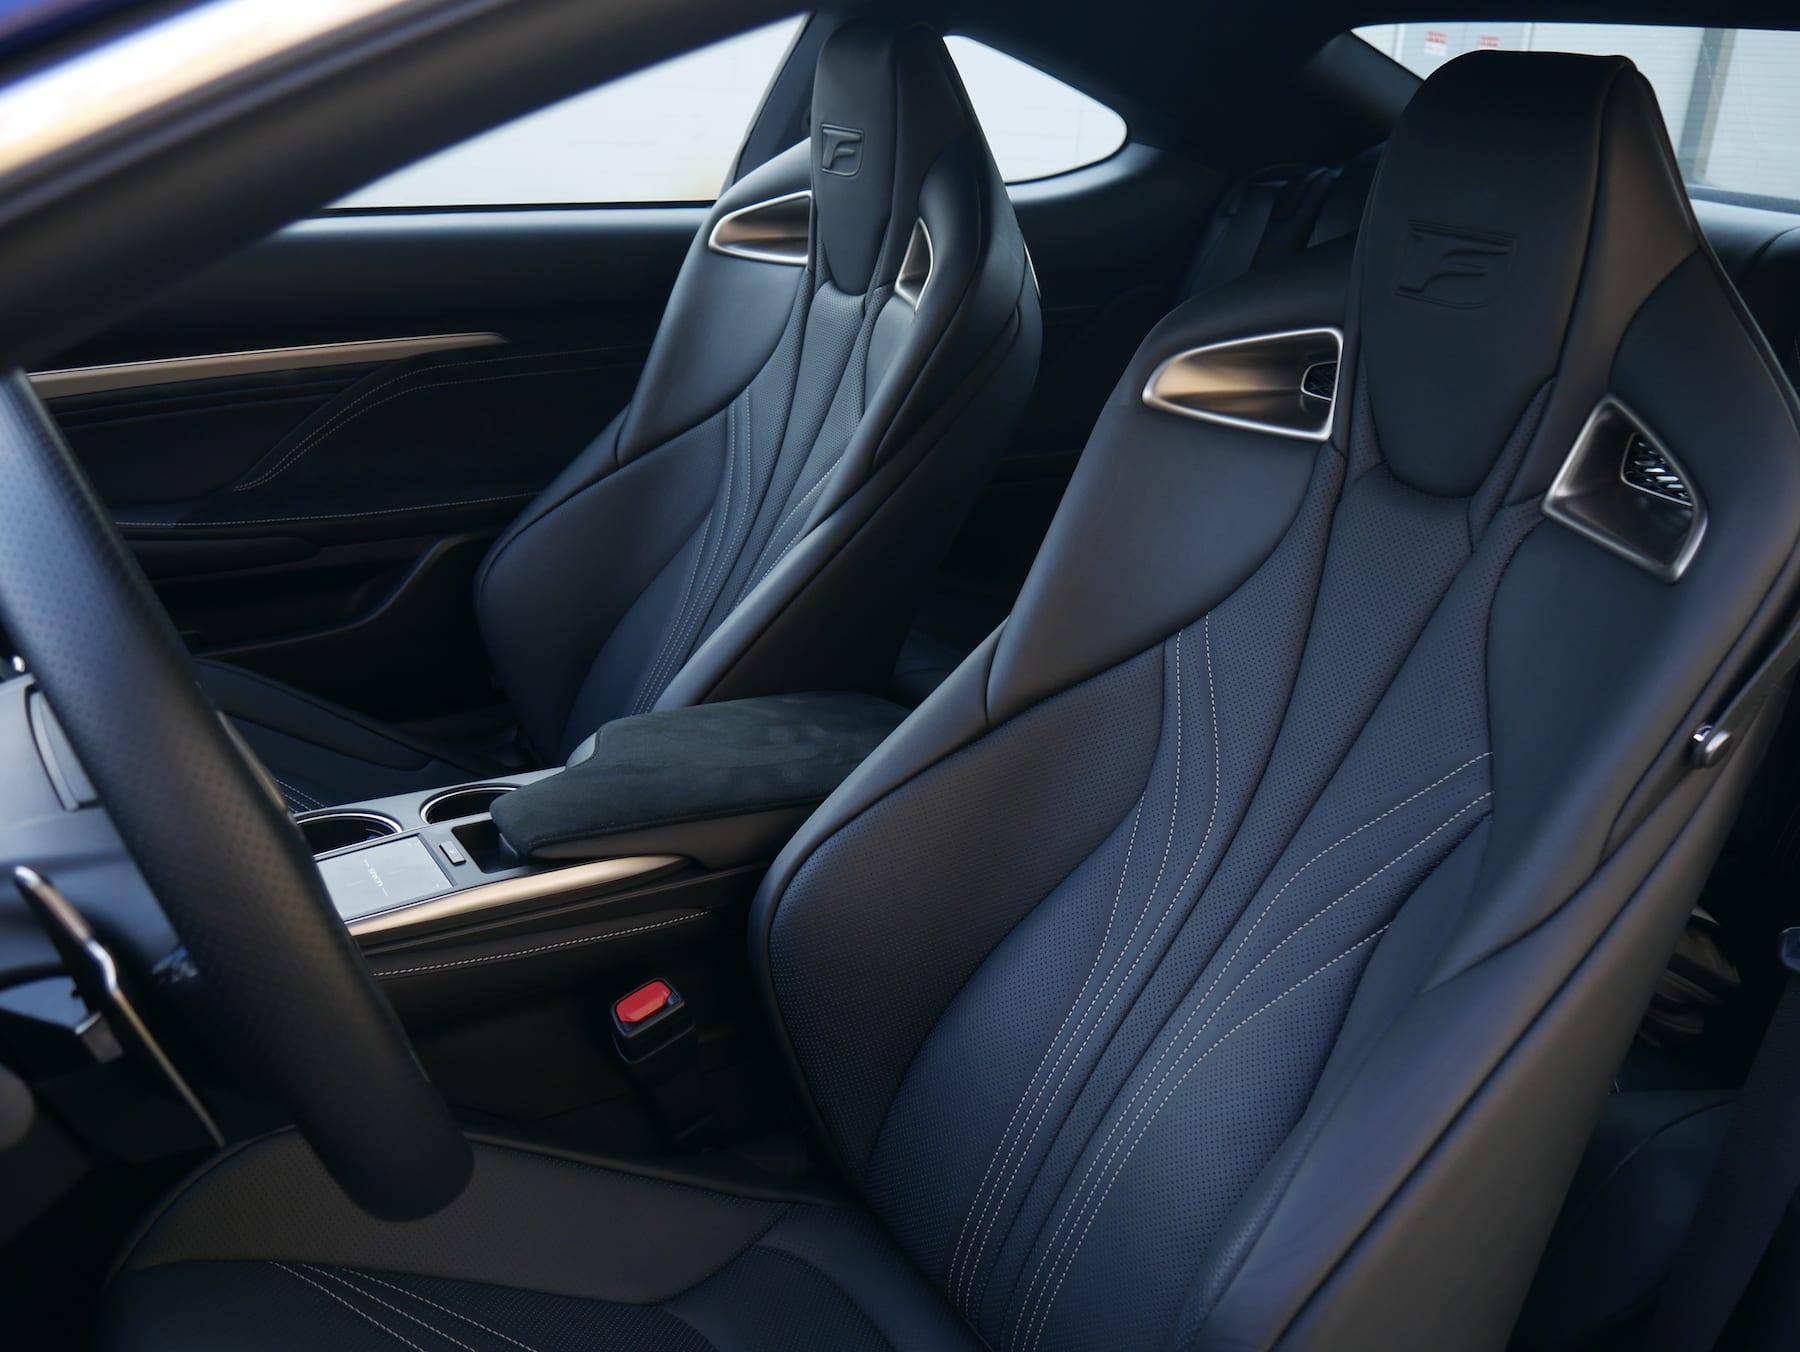 2019 Lexus RC F front seats